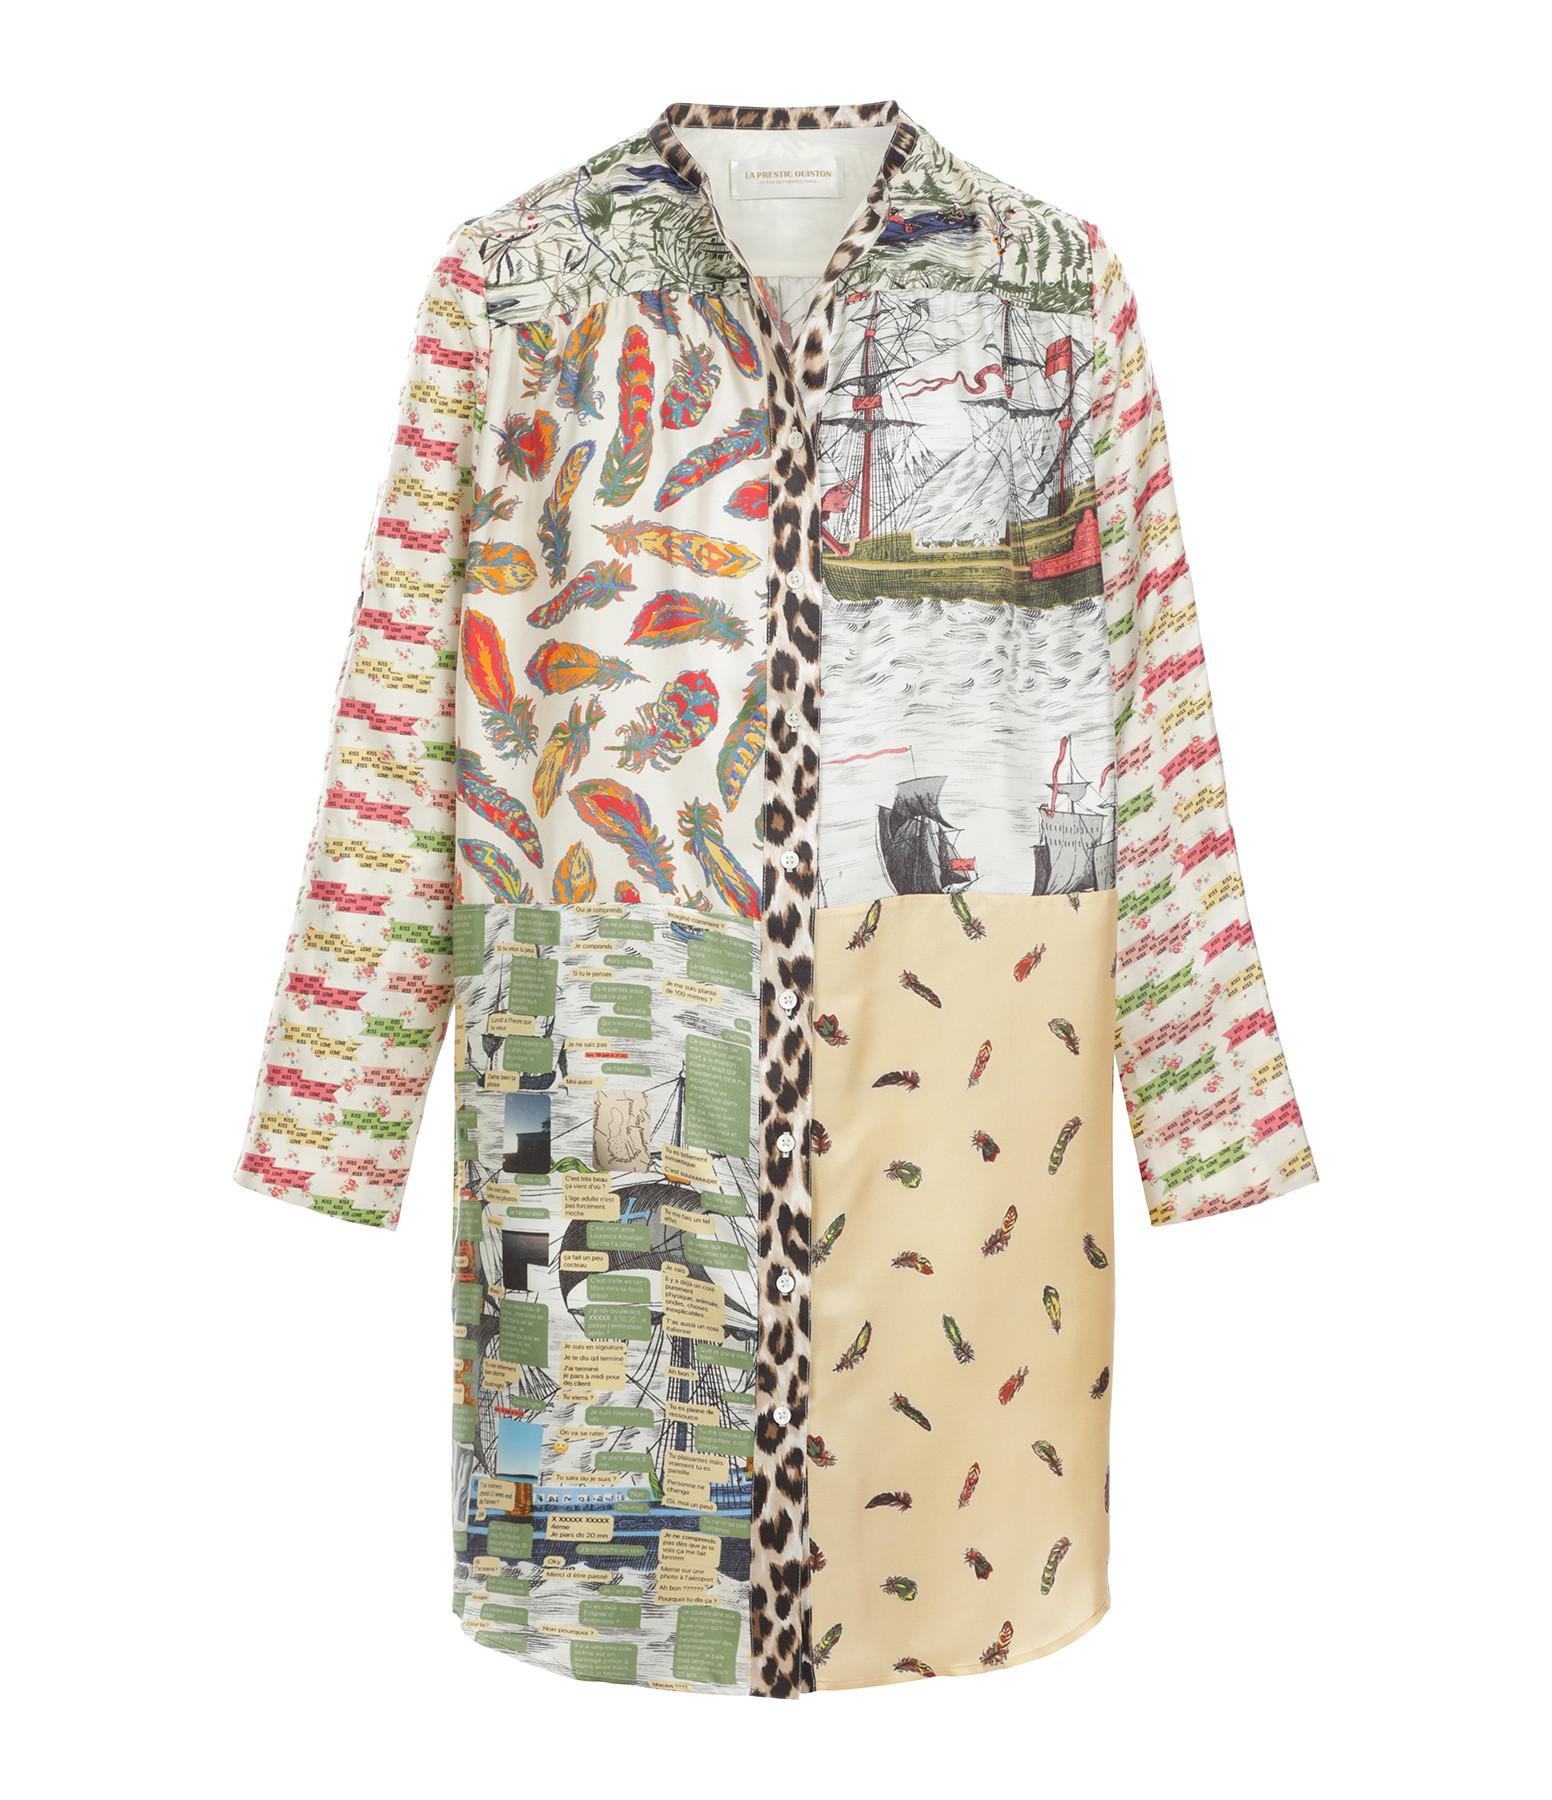 LA PRESTIC OUISTON - Robe Open It Soie Barques Imprimé